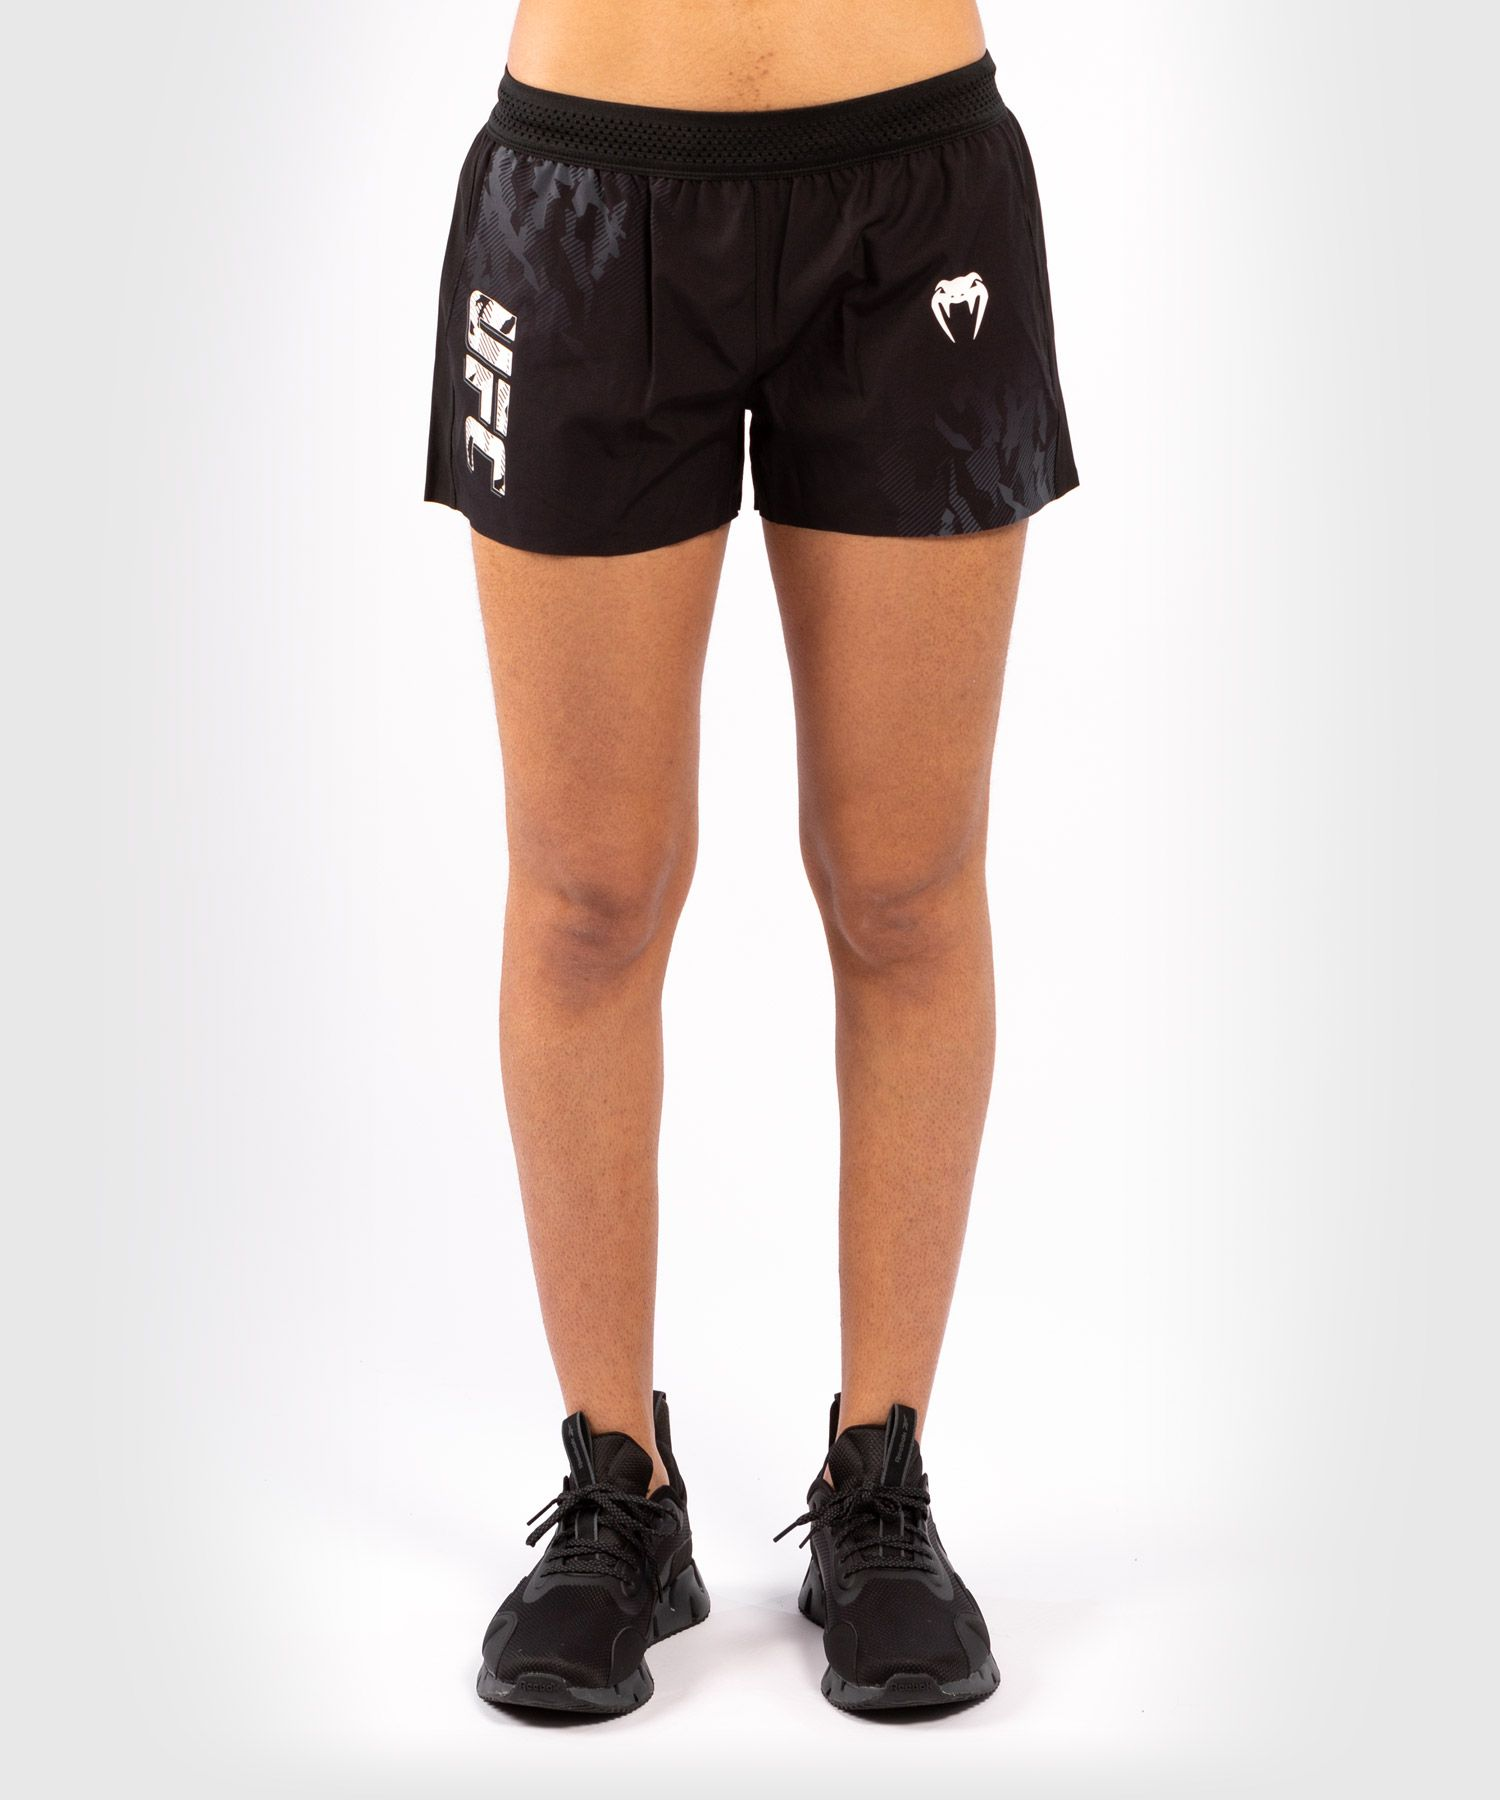 UFC Venum Authentic Fight Week Women's Performance Shorts - Black